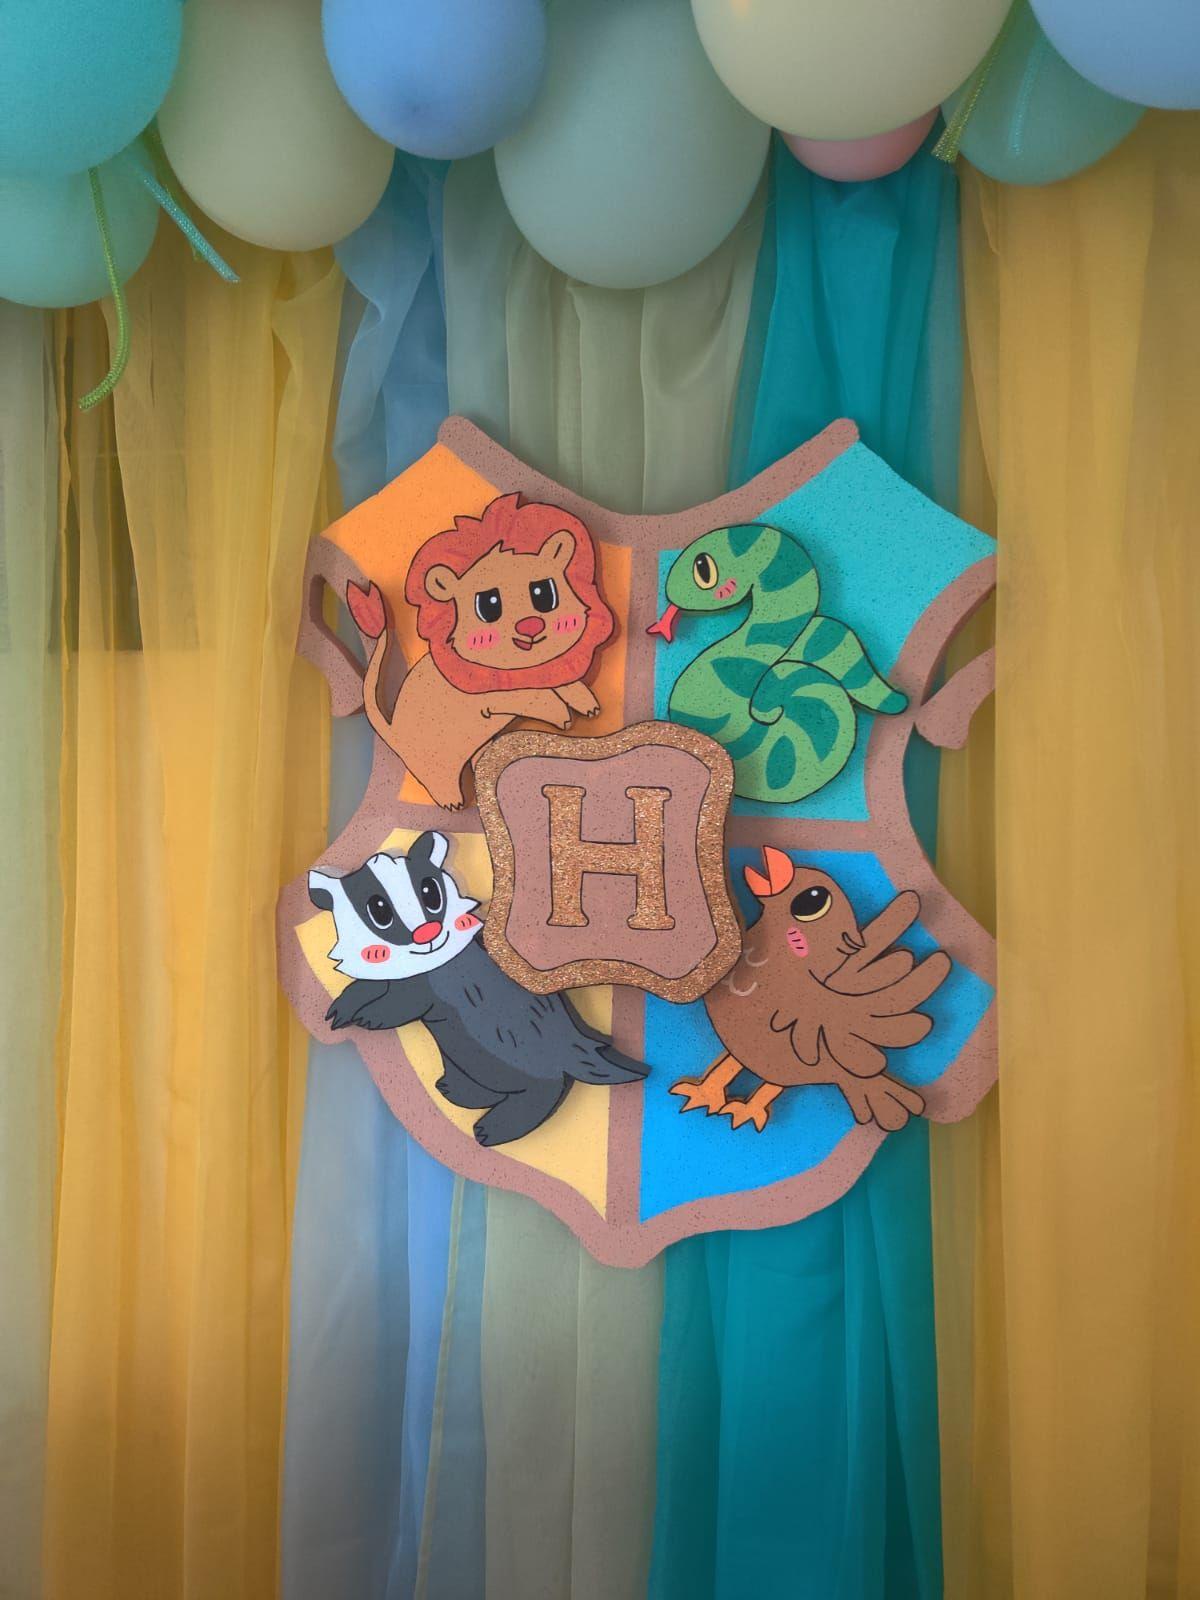 Diy foam hogwarts crest for baby boy harry potter birthday